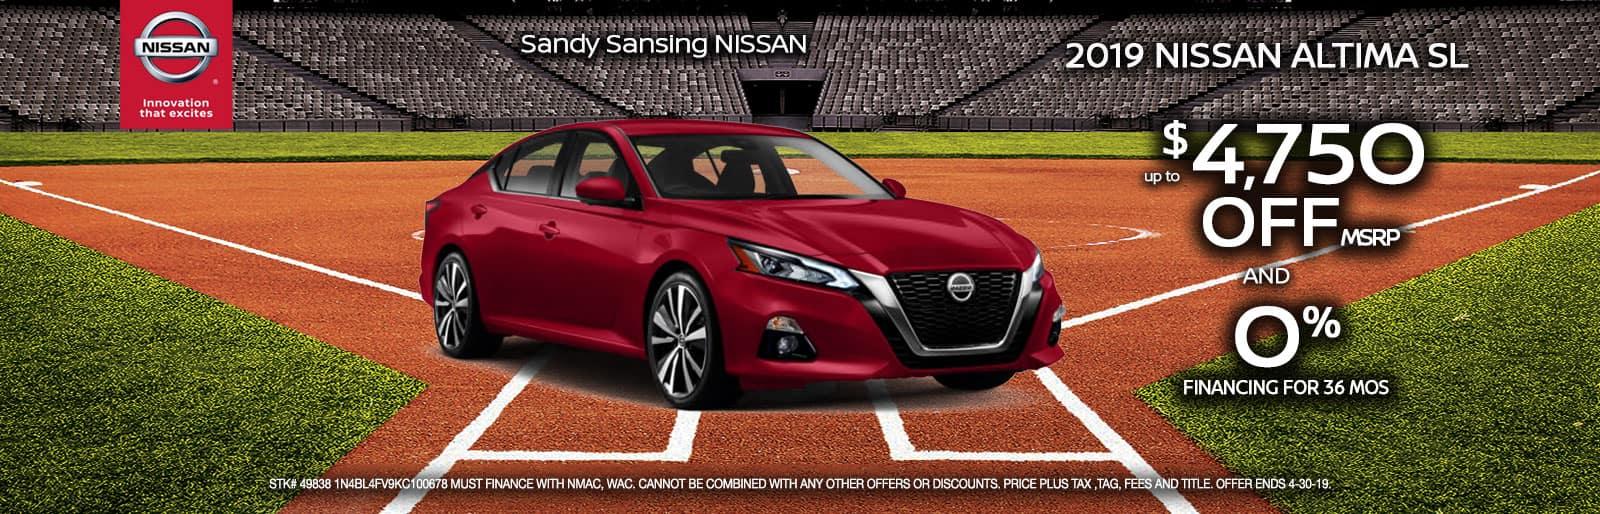 Sandy Sansing Nissan Pensacola FL Altima